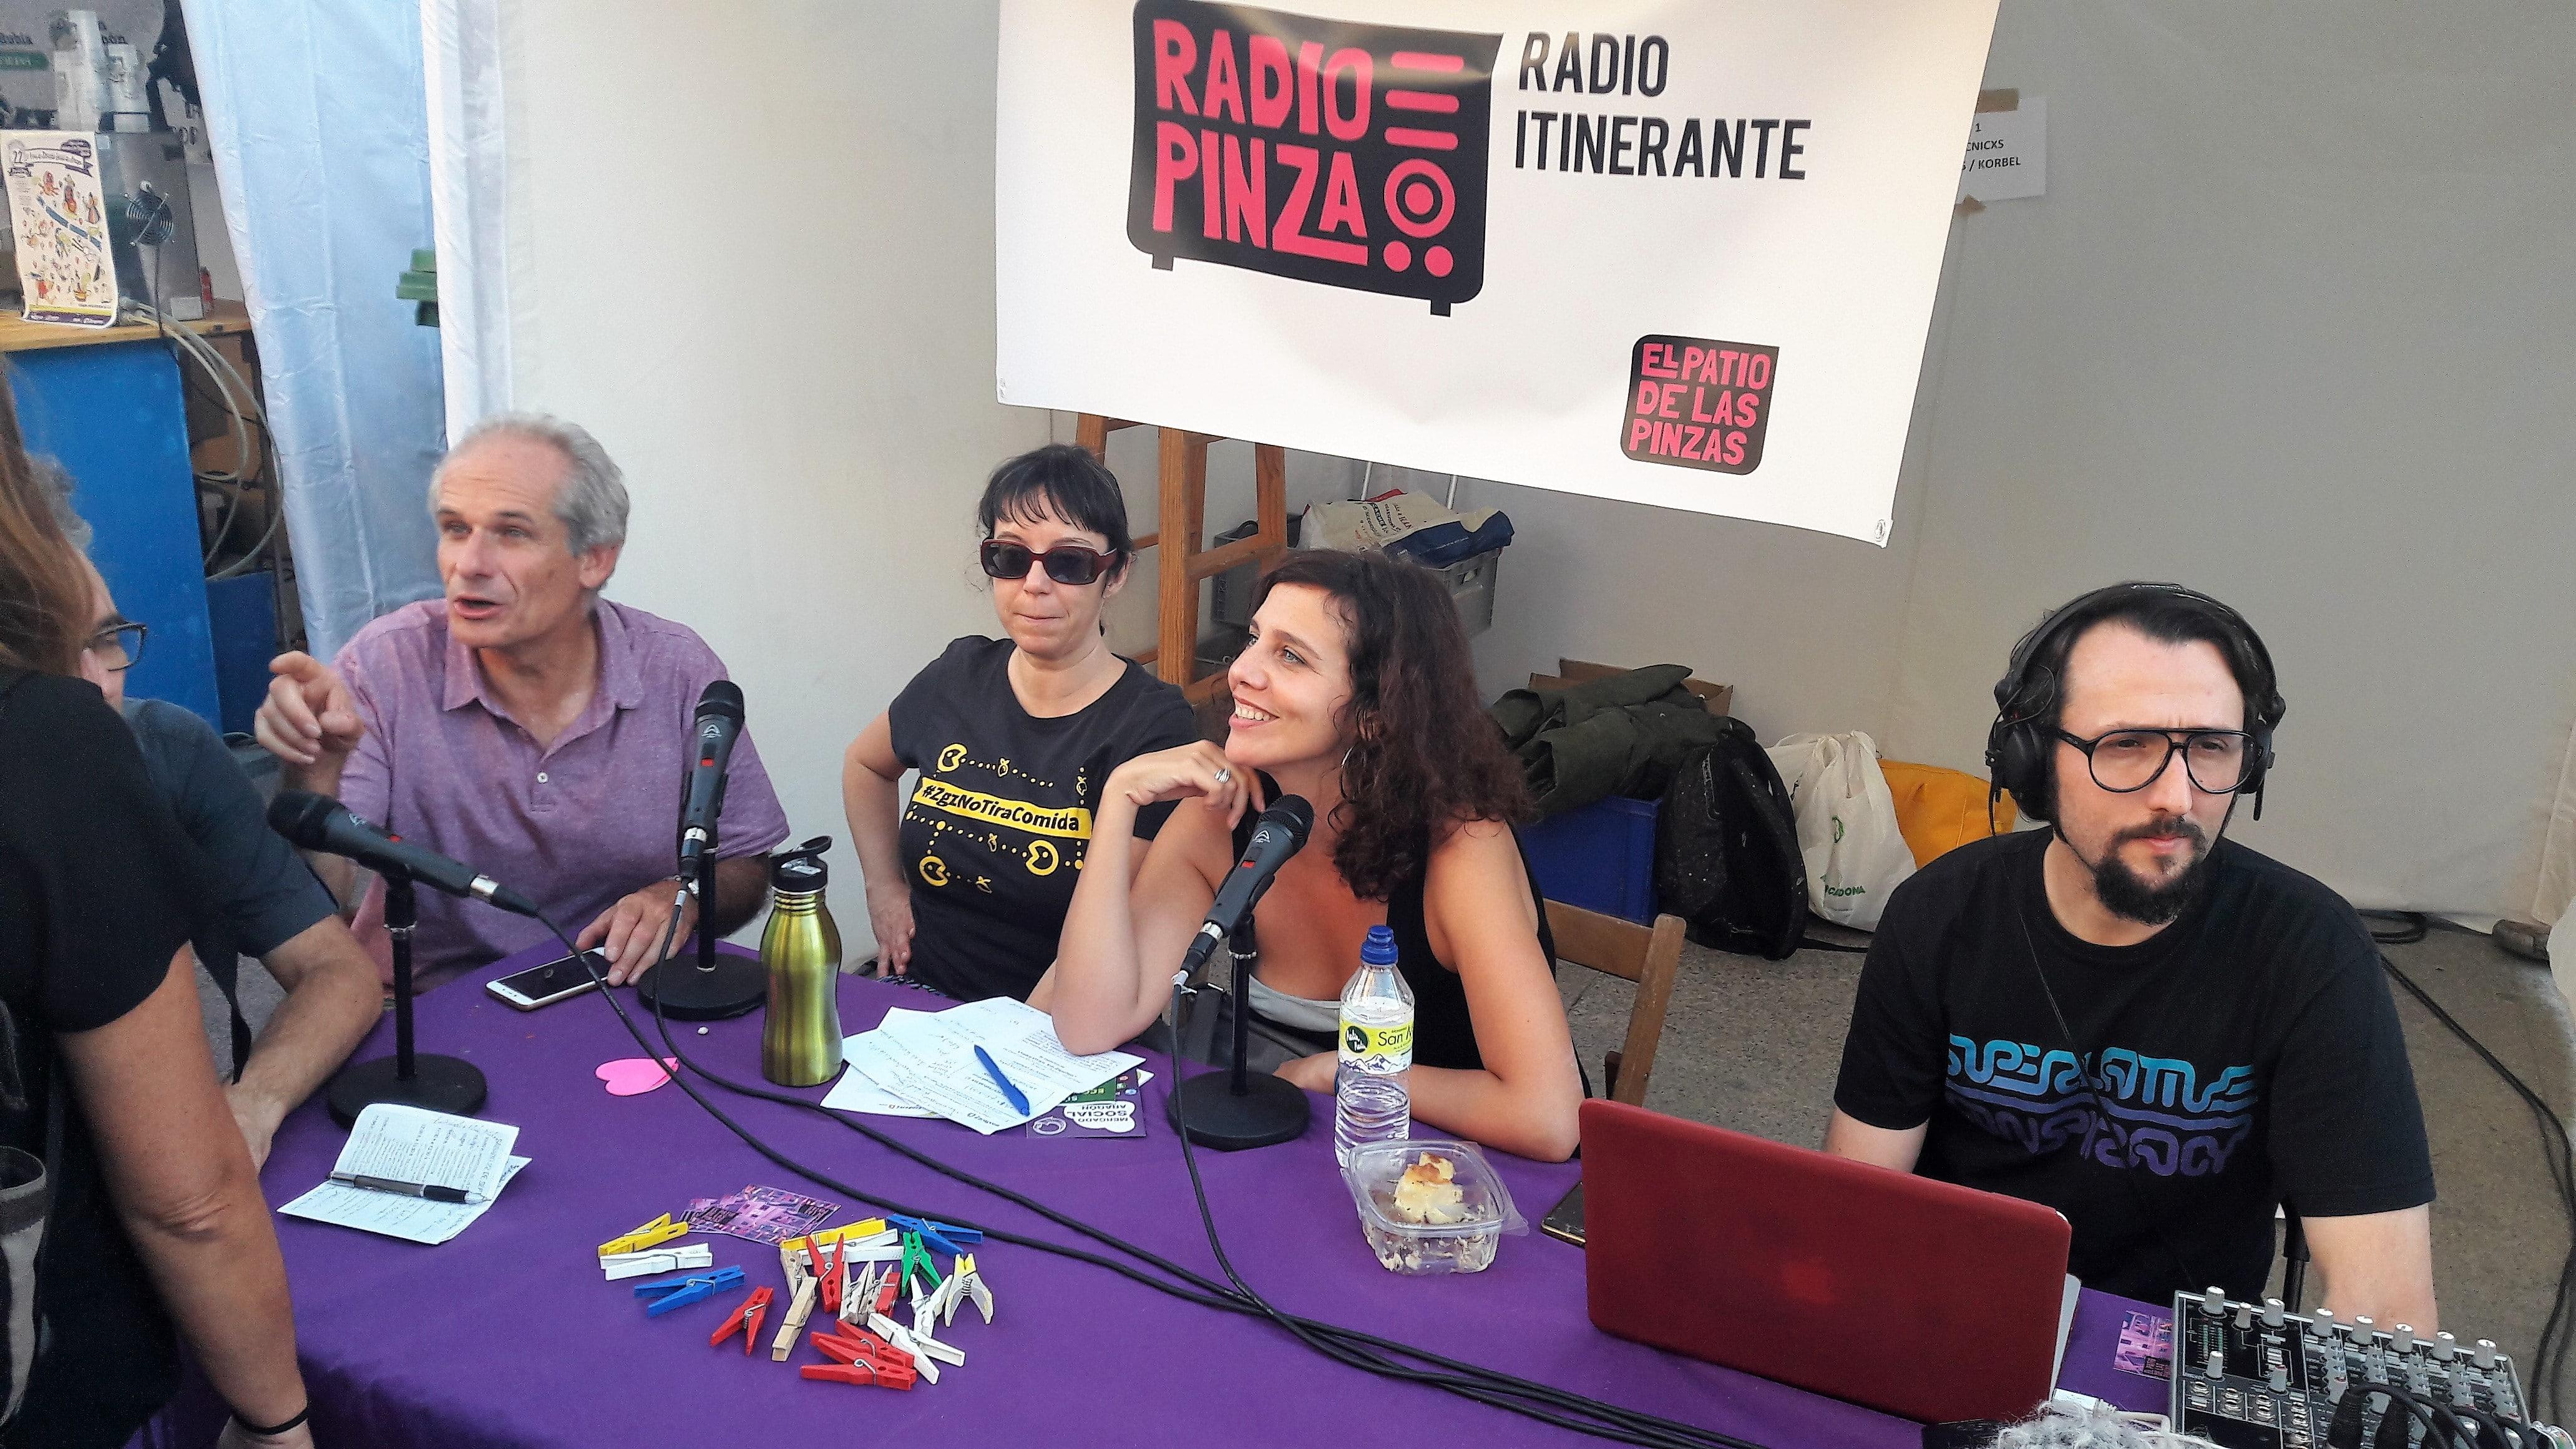 RADIO PINZA RADIO ITINERANTE